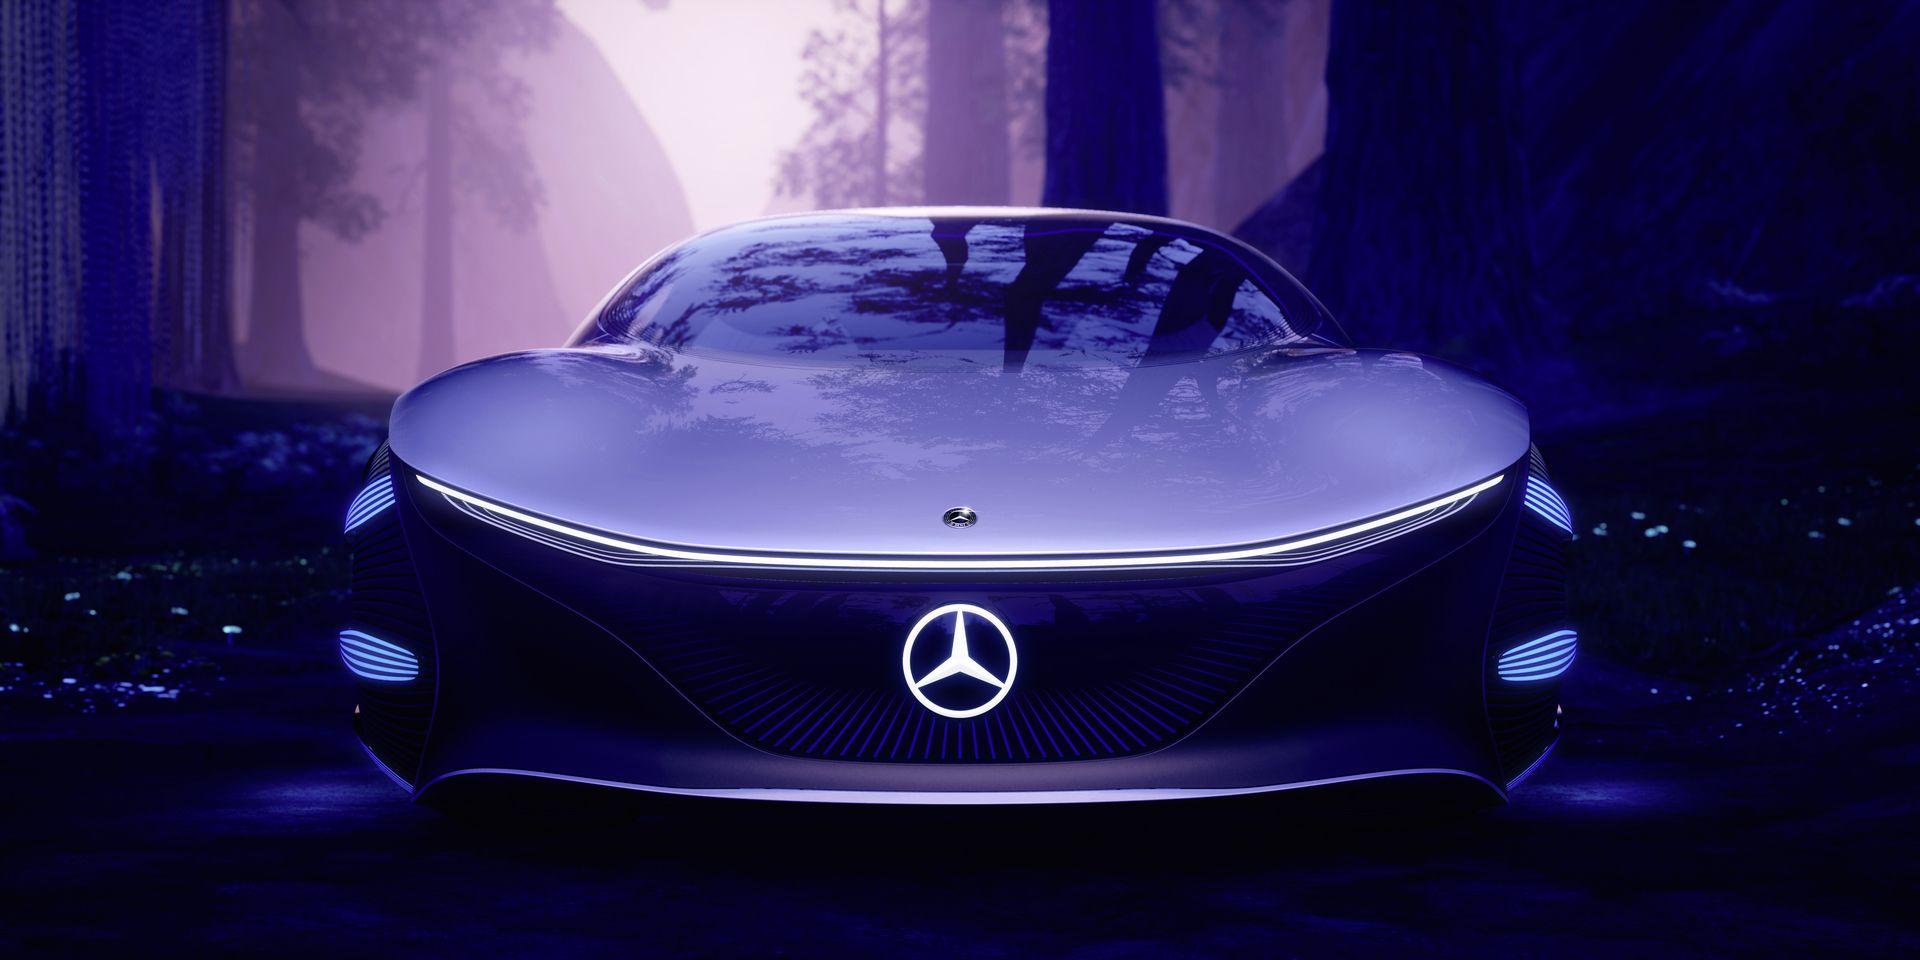 Mercedes Benz Avatar - Neomag.